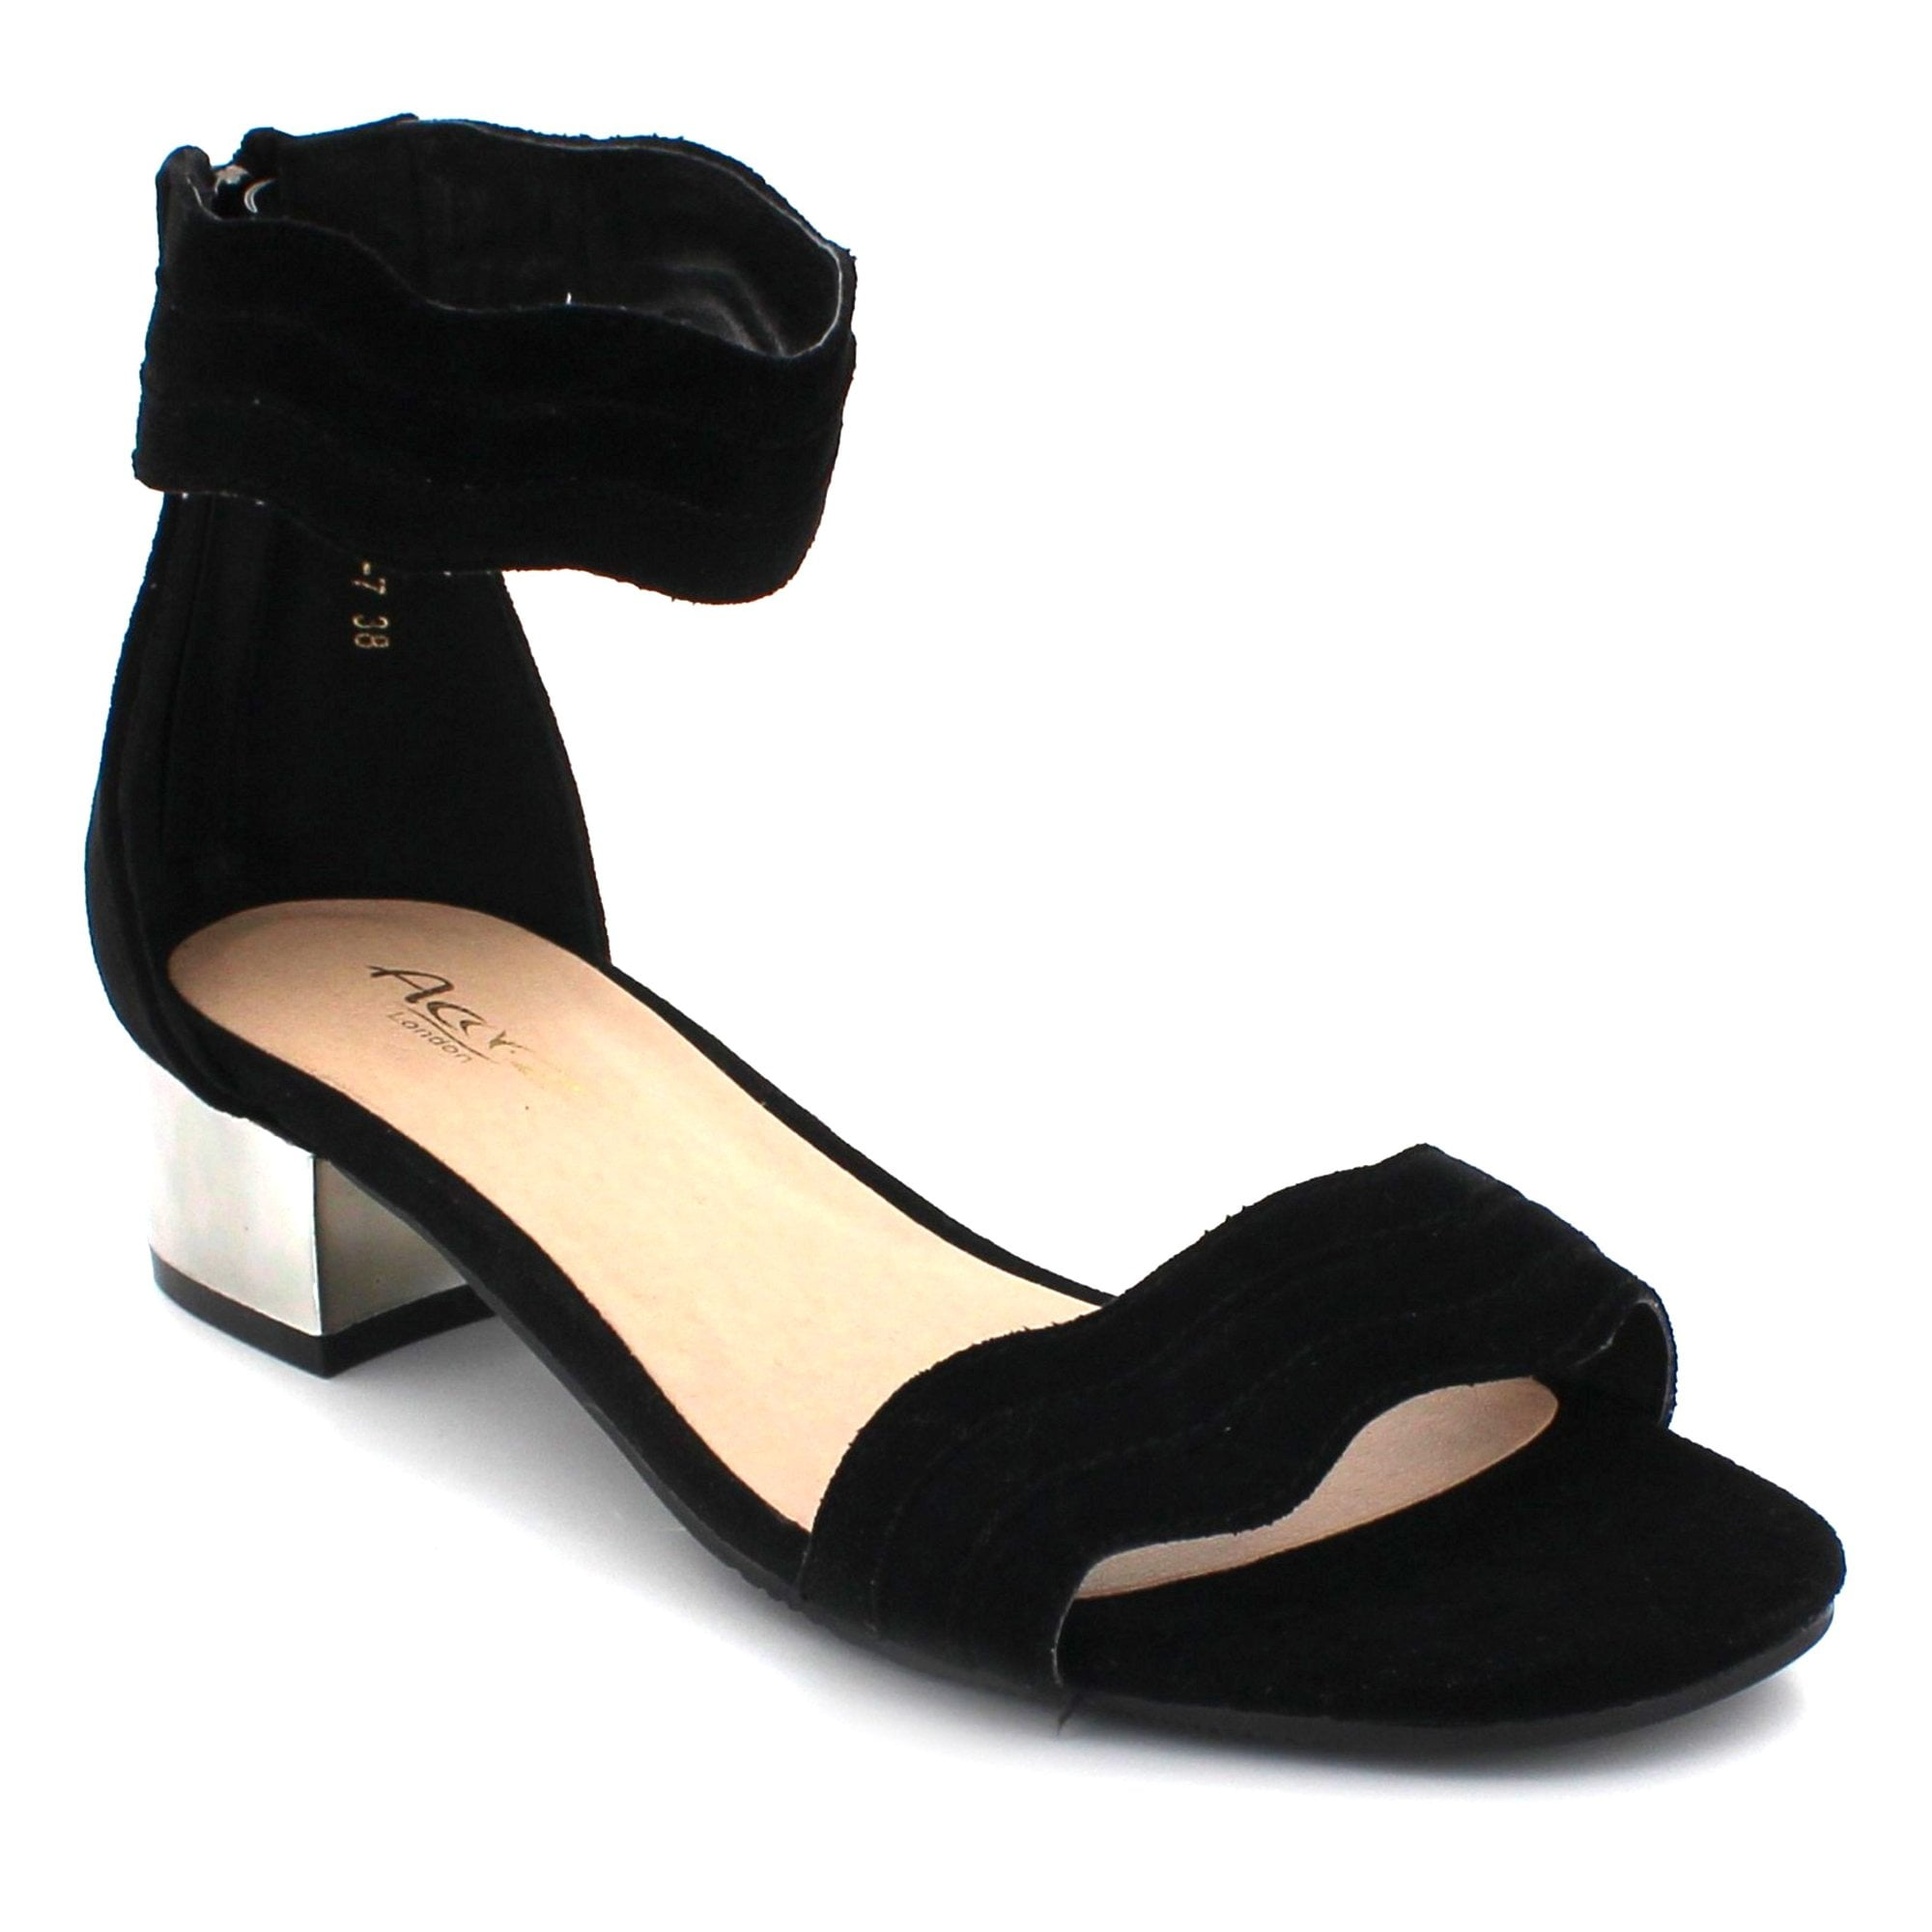 61aa64f4639 Aarz London Patsy- Stylish Comfortable Sandals